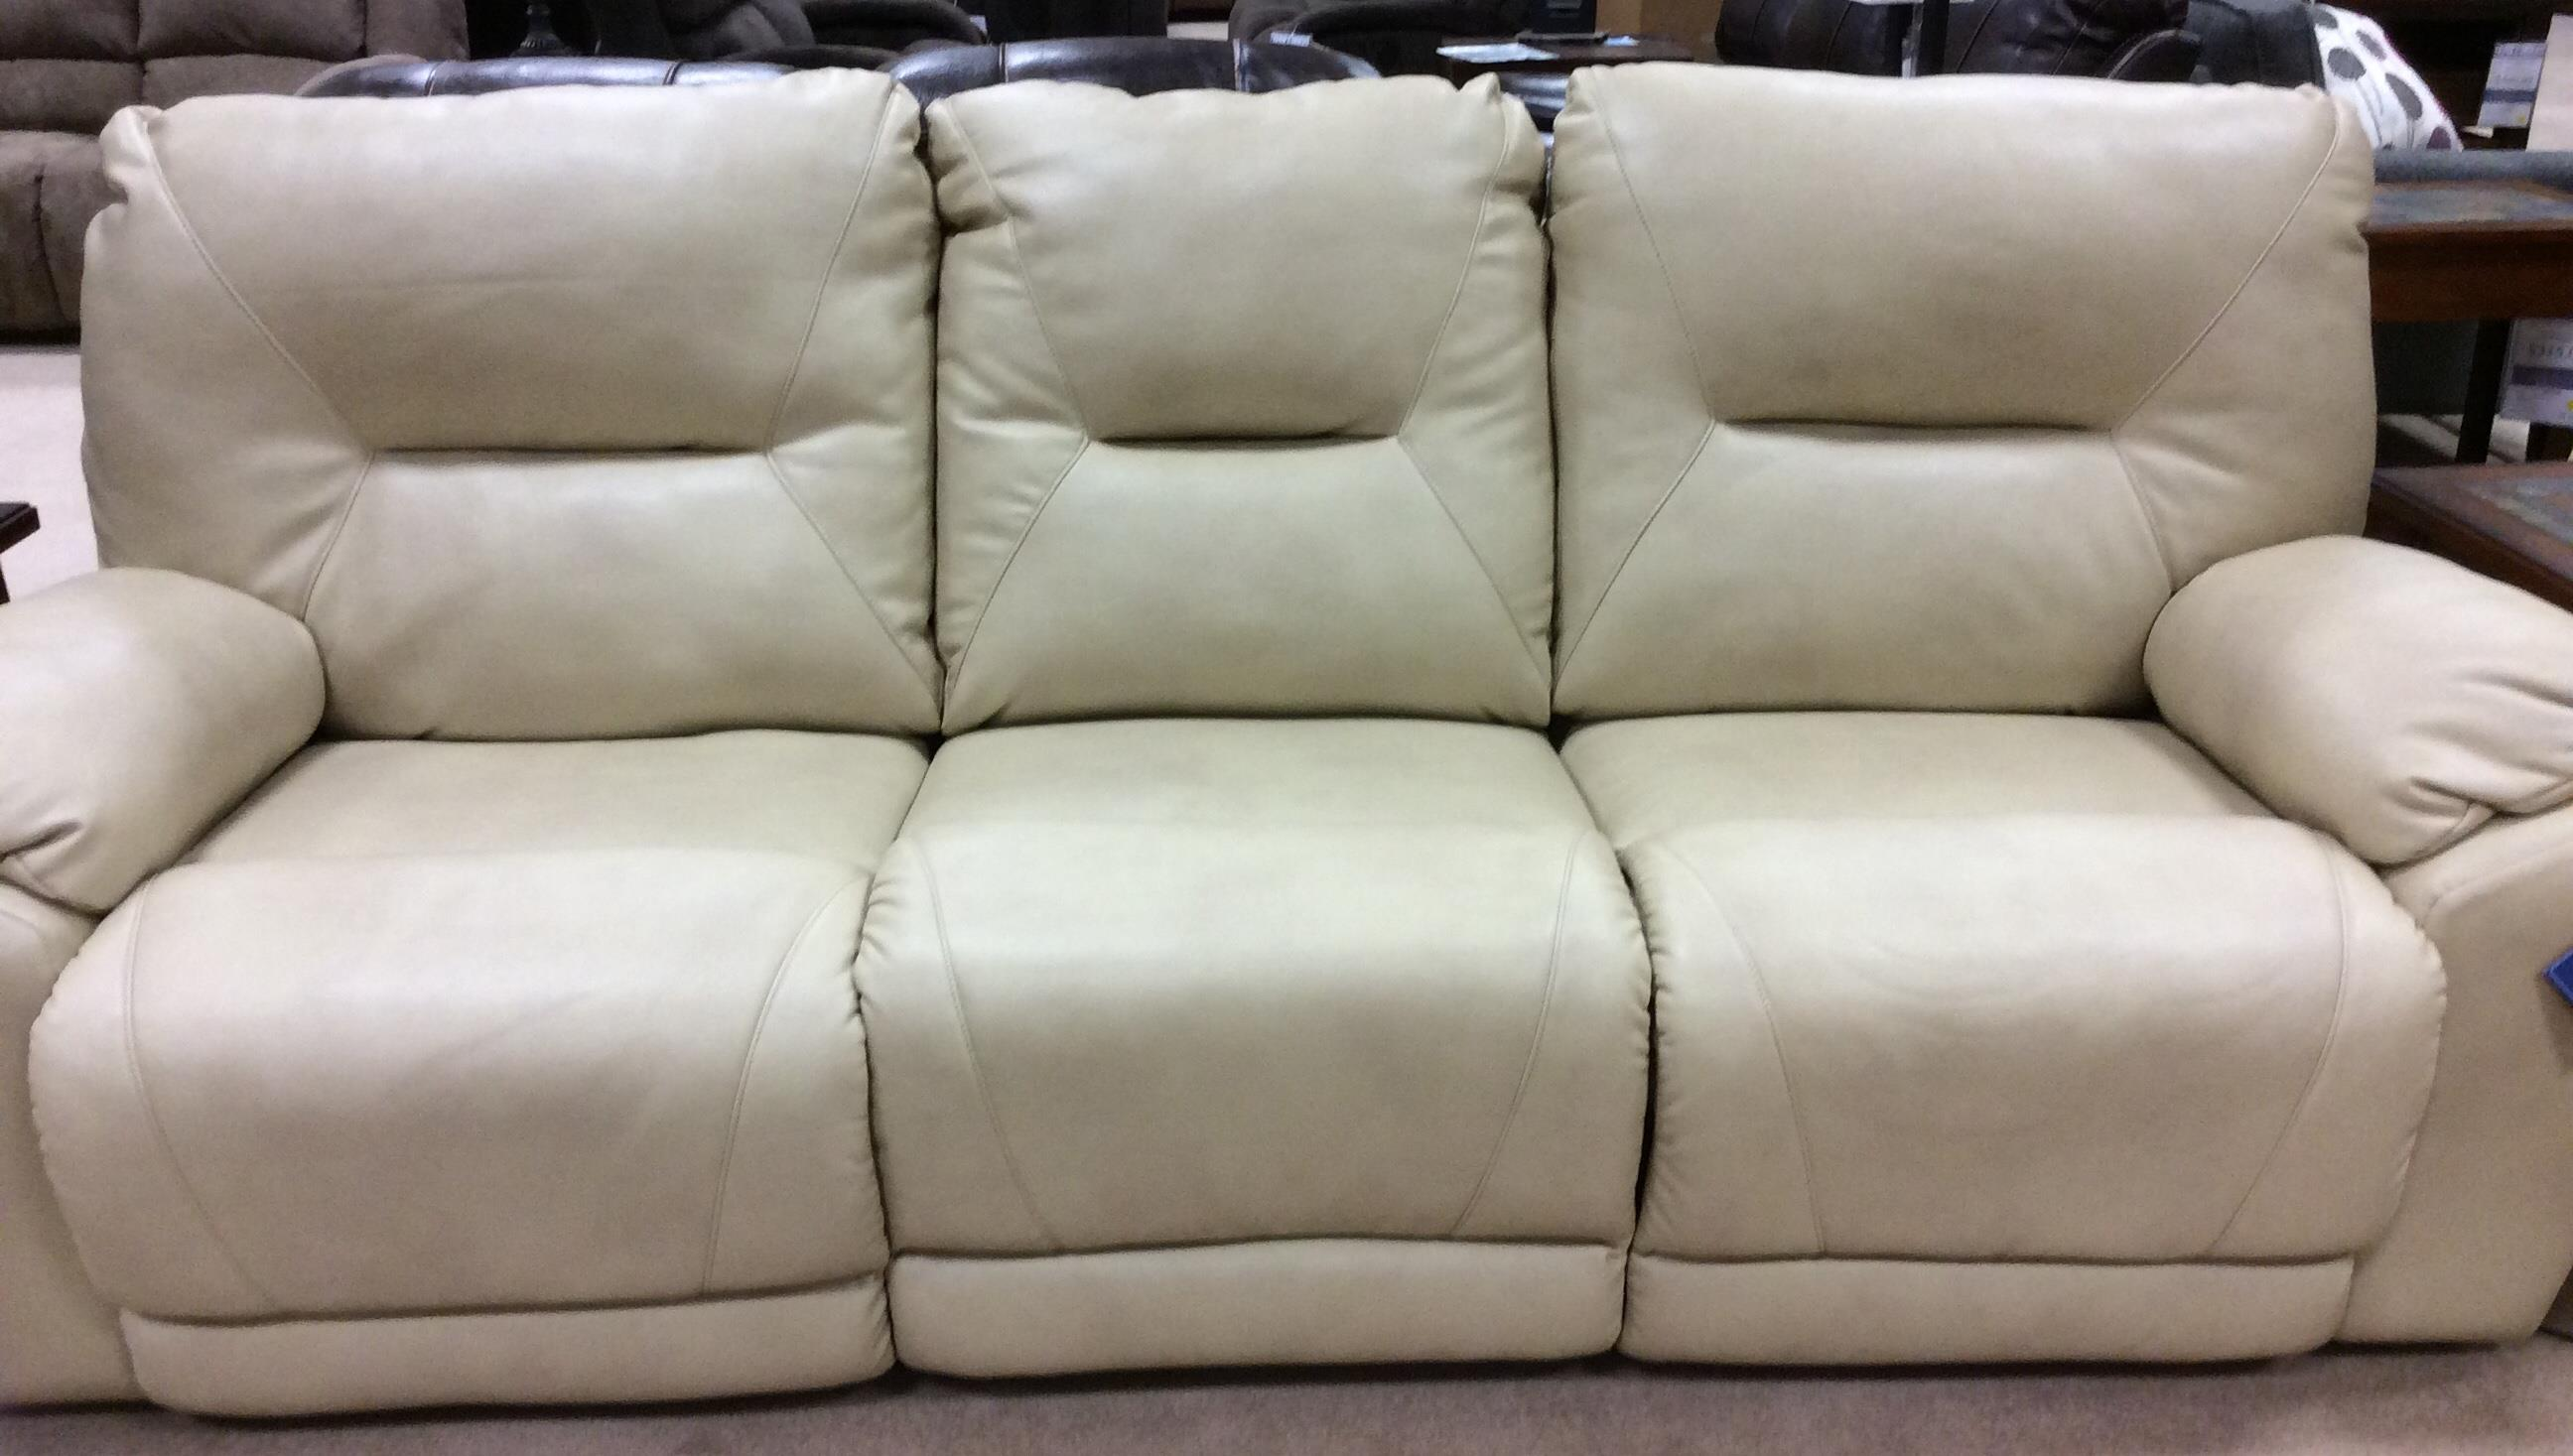 lane molly double reclining sofa retro orange leather | slipcover ...